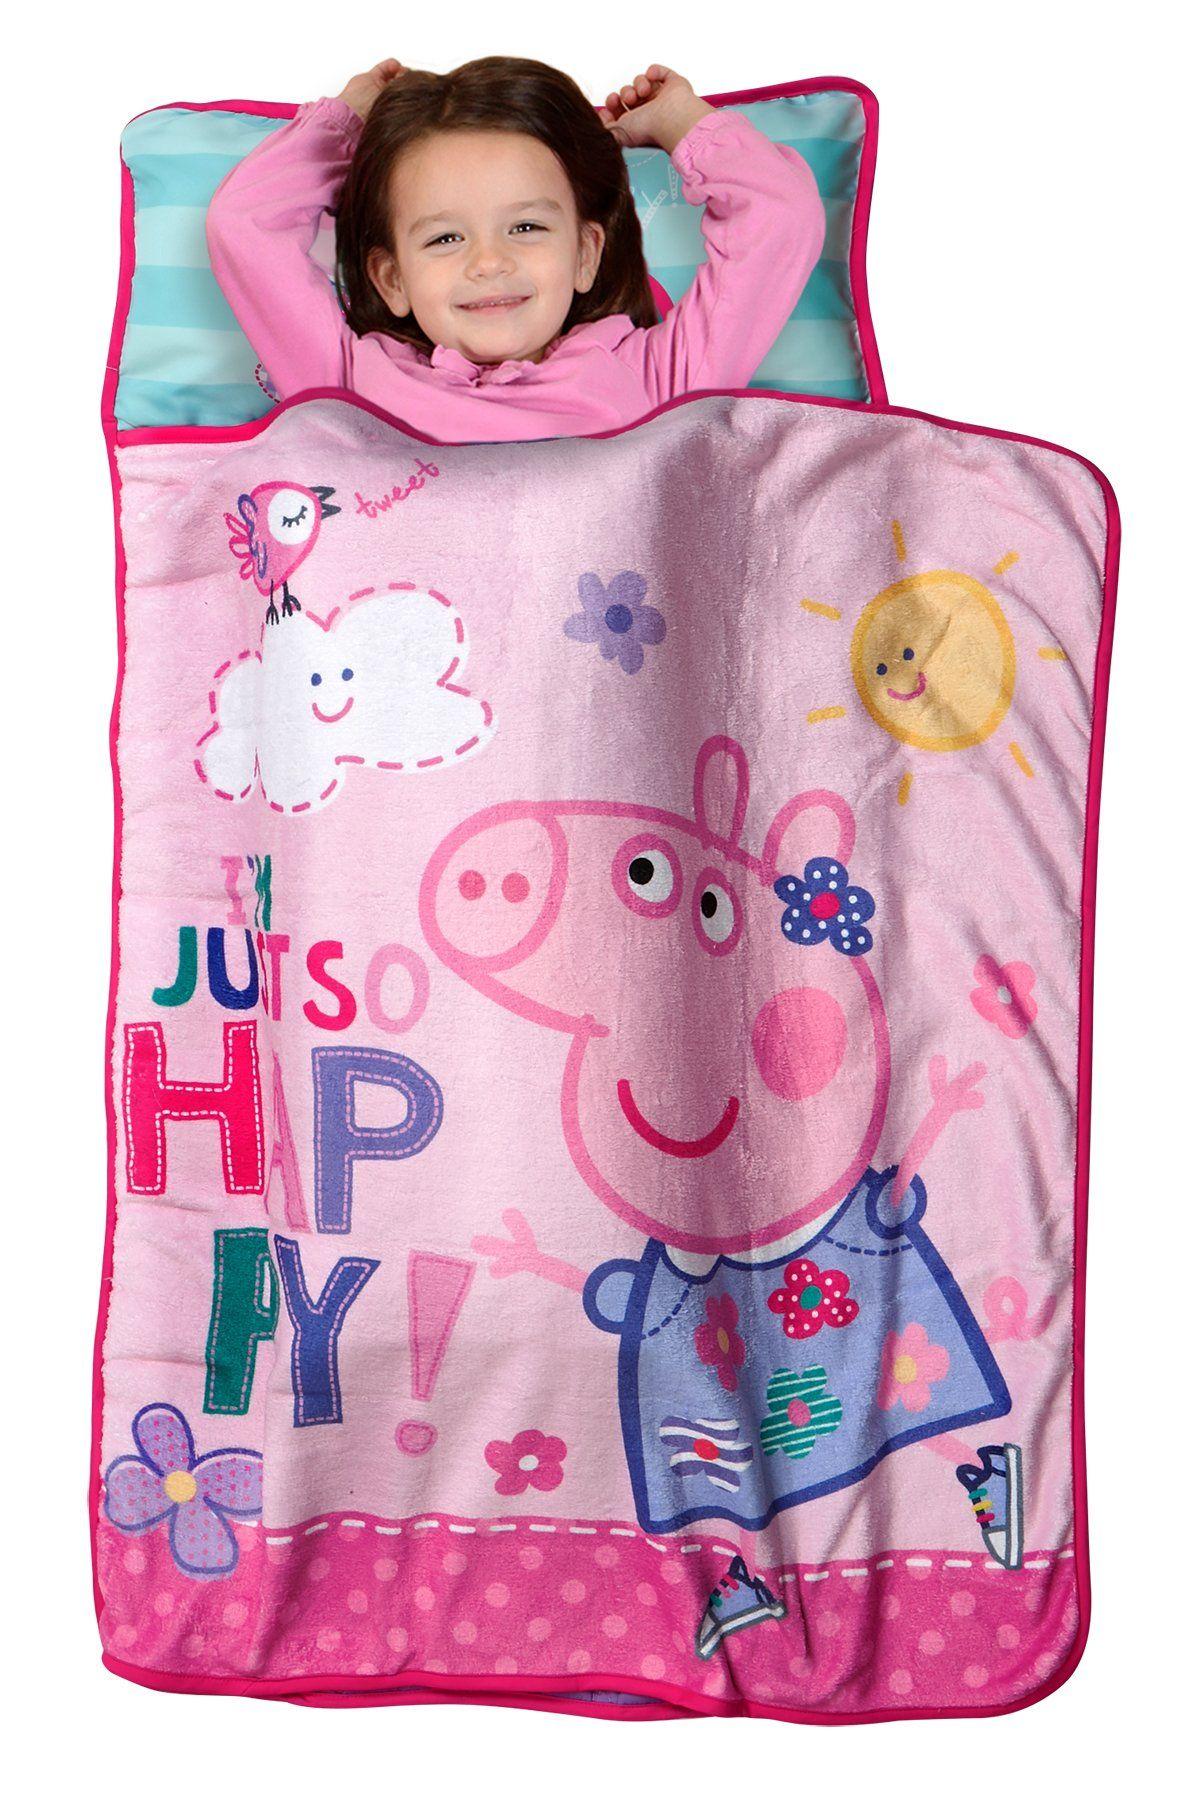 PILLOW Bed Set New NAP MAT Toddler Daycare Preschool BLANKET